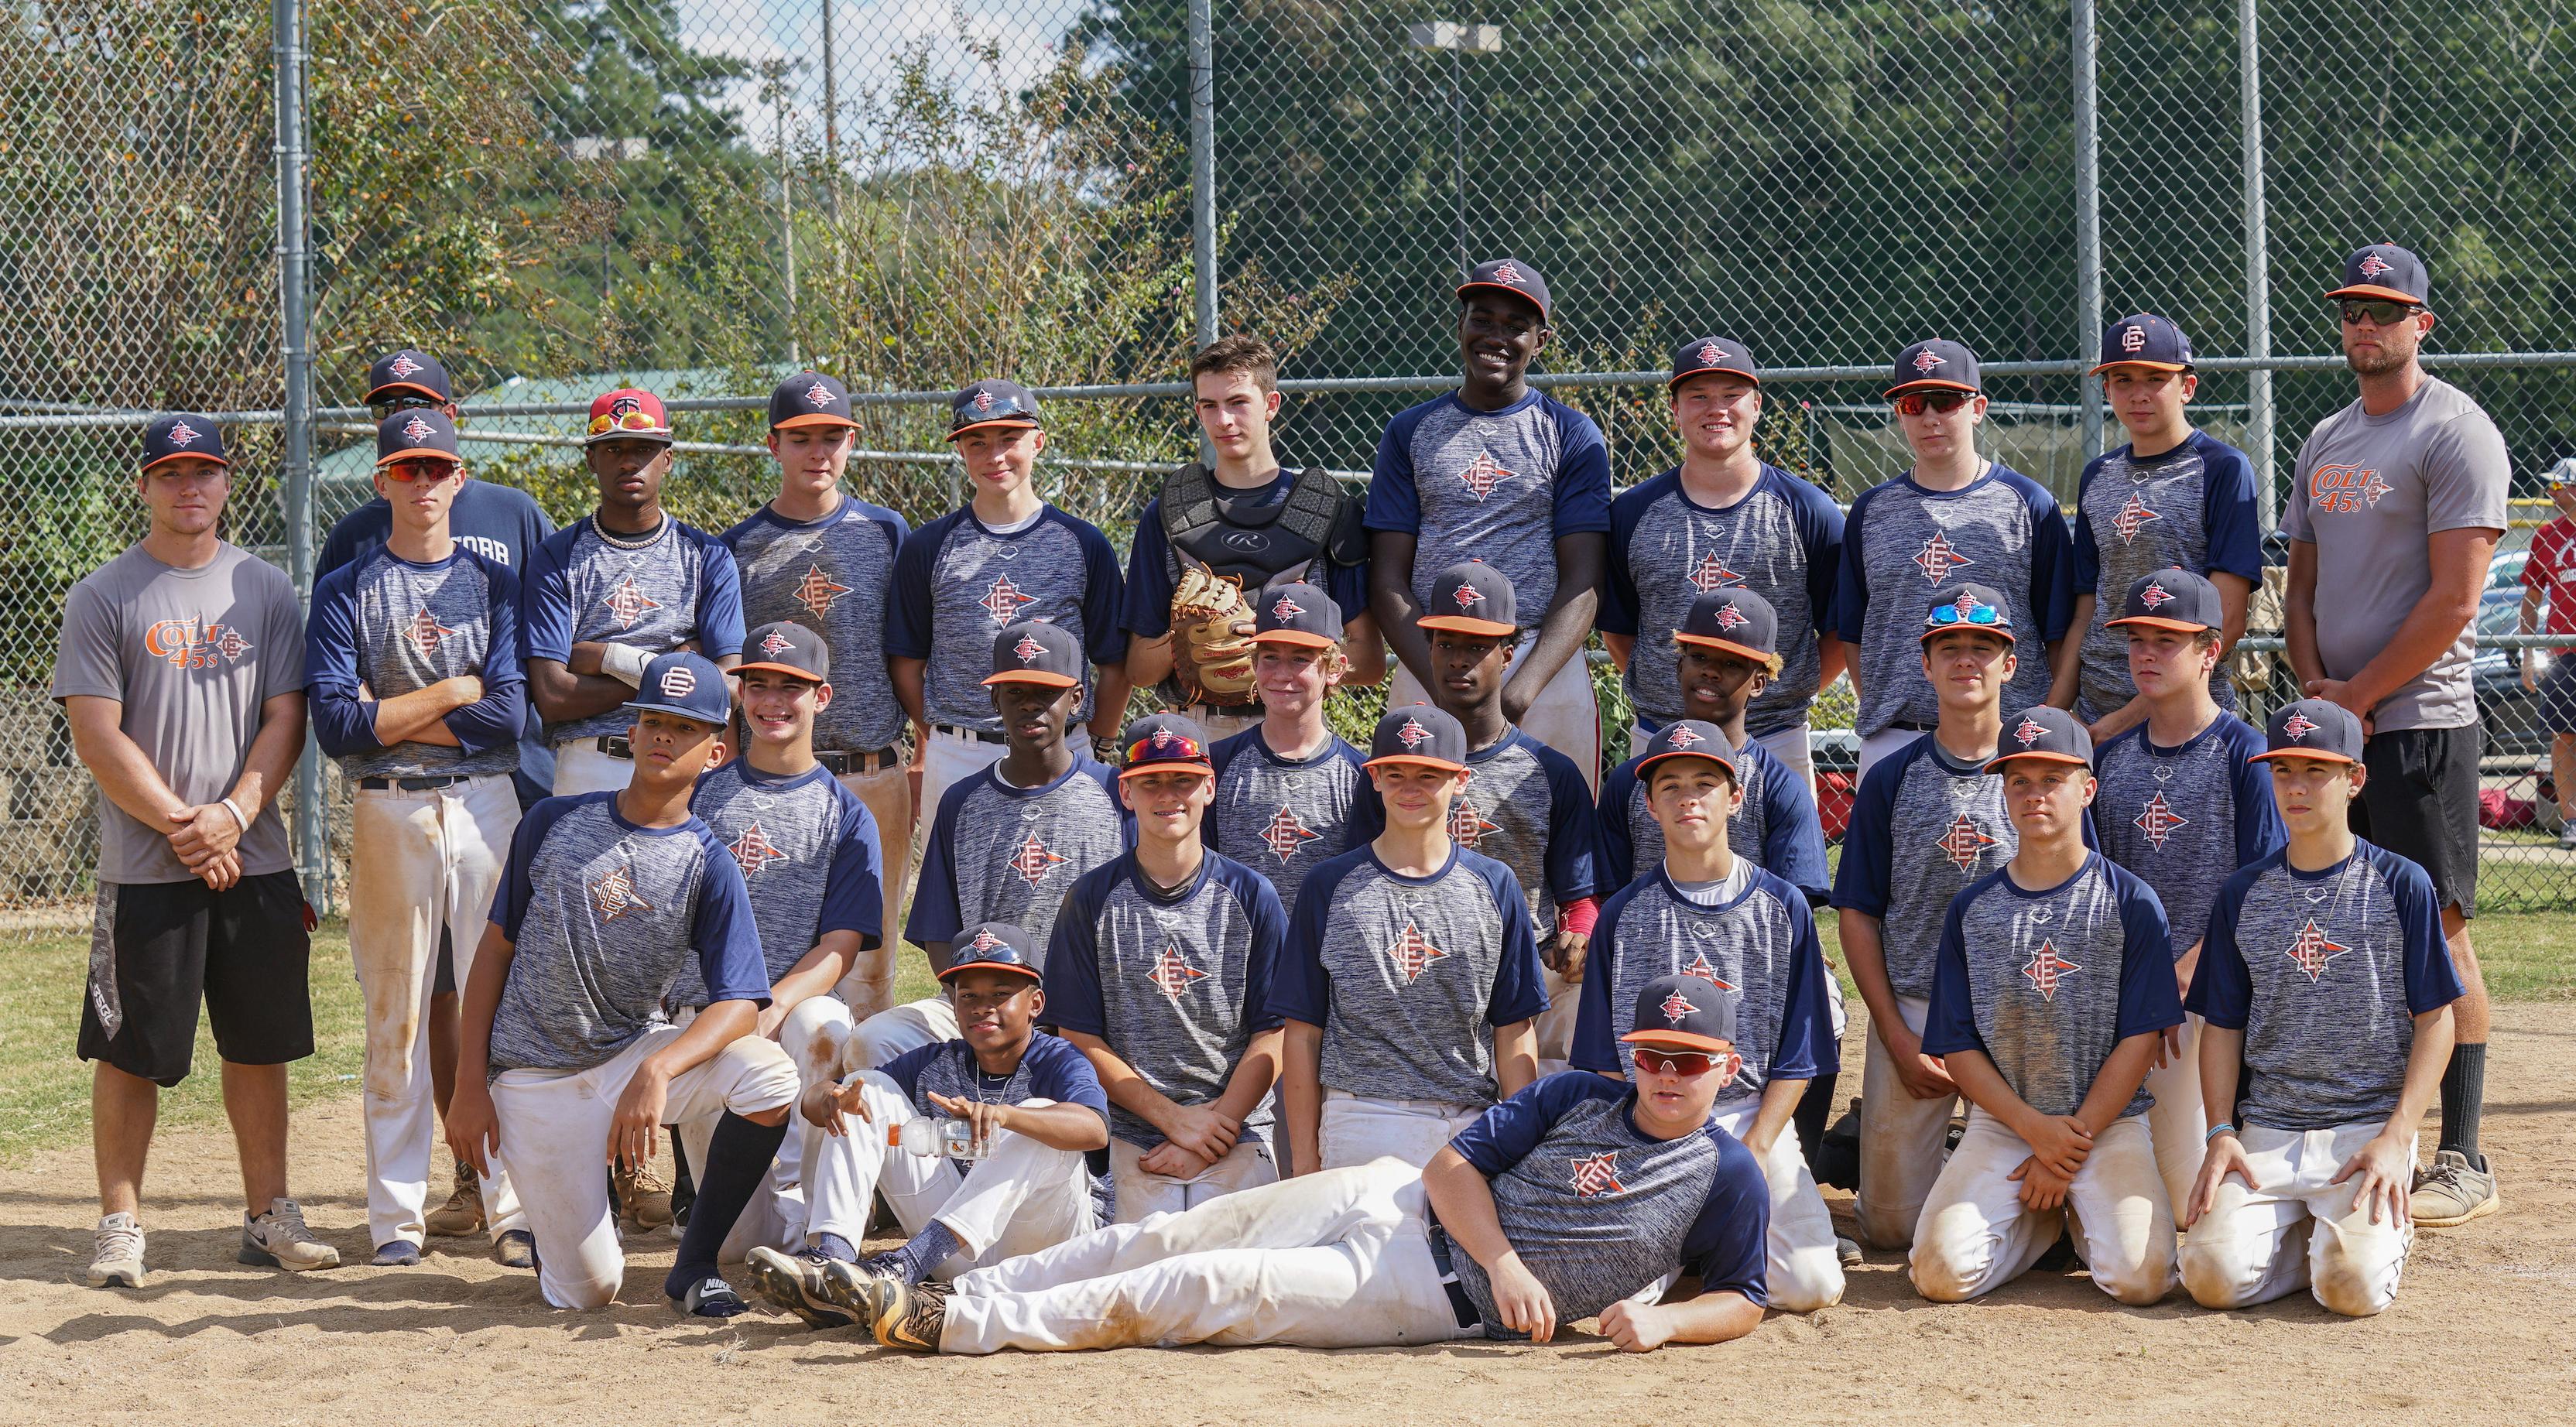 East Cobb Baseball